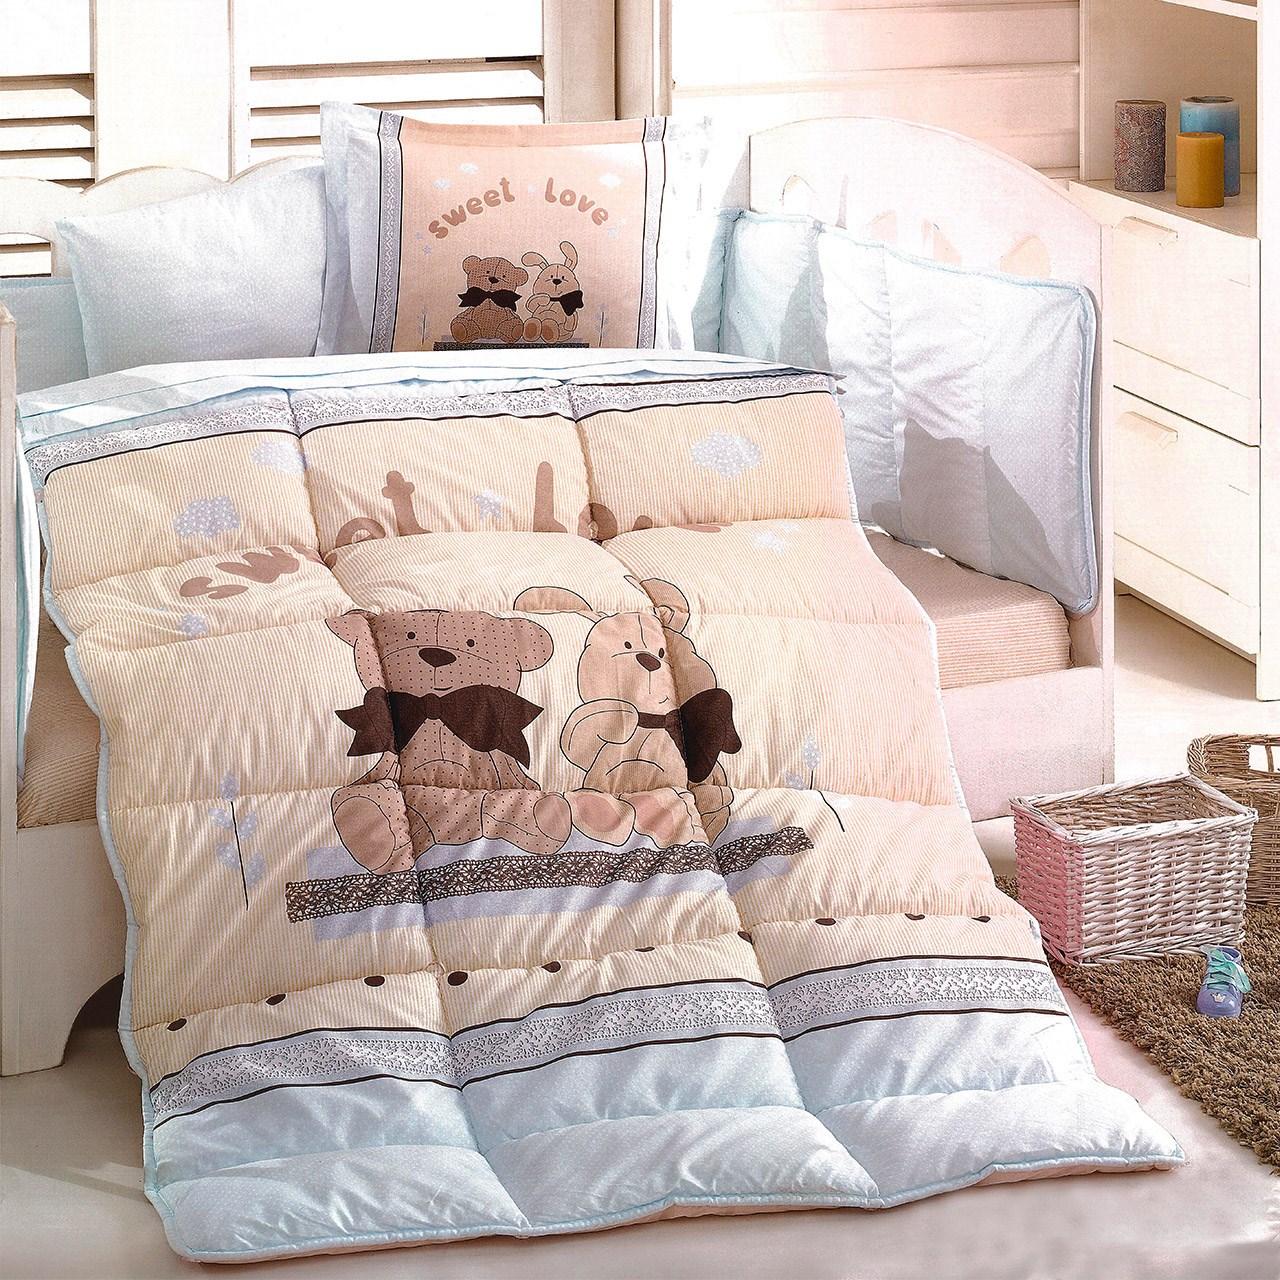 سرویس لحاف 8 تکه خواب نوزاد ازدیلک سری رنفورس طرح Bear and rabbit